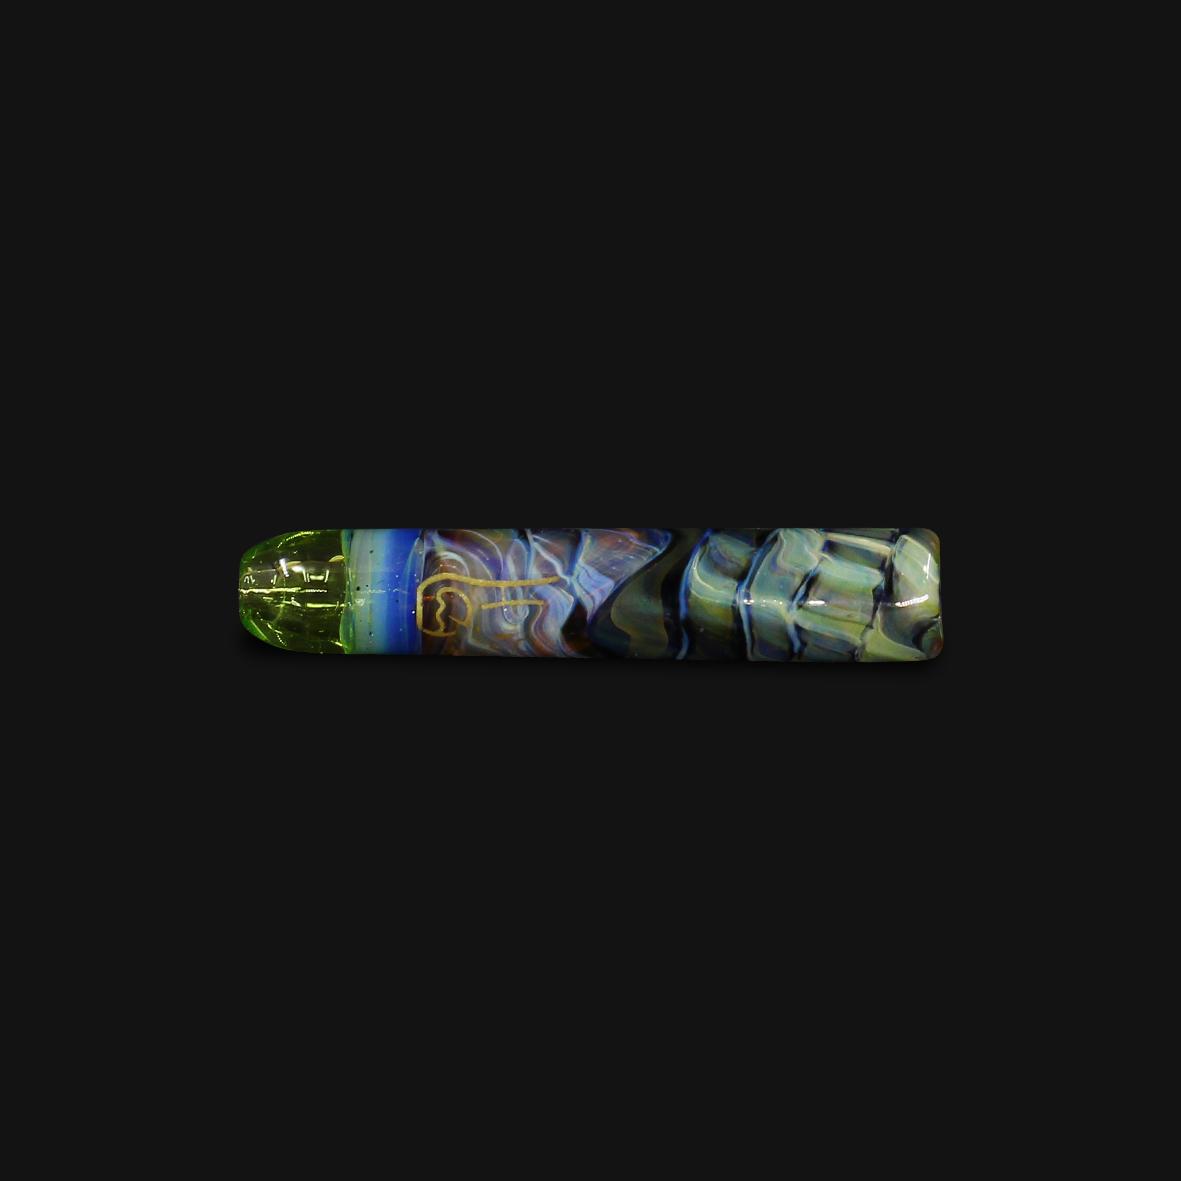 Piteira de Vidro Optical Illusion  #04